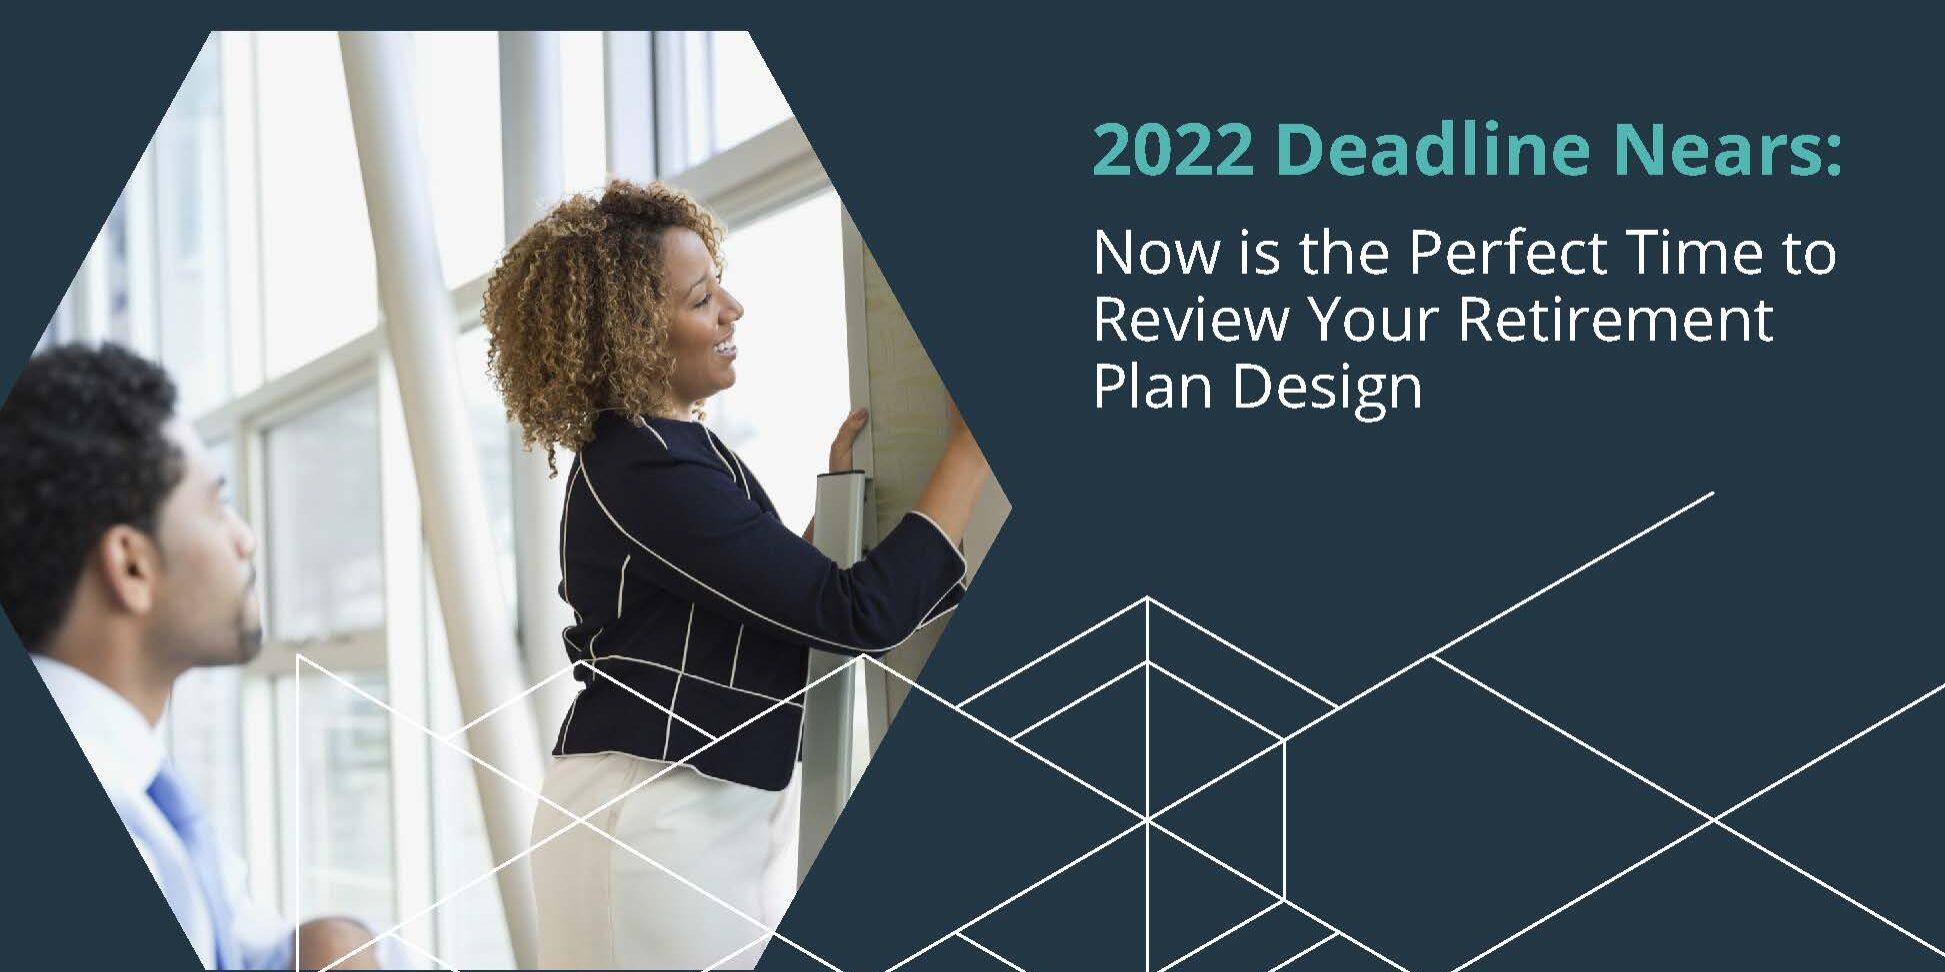 Headline Image 3-2022 Deadline Nears